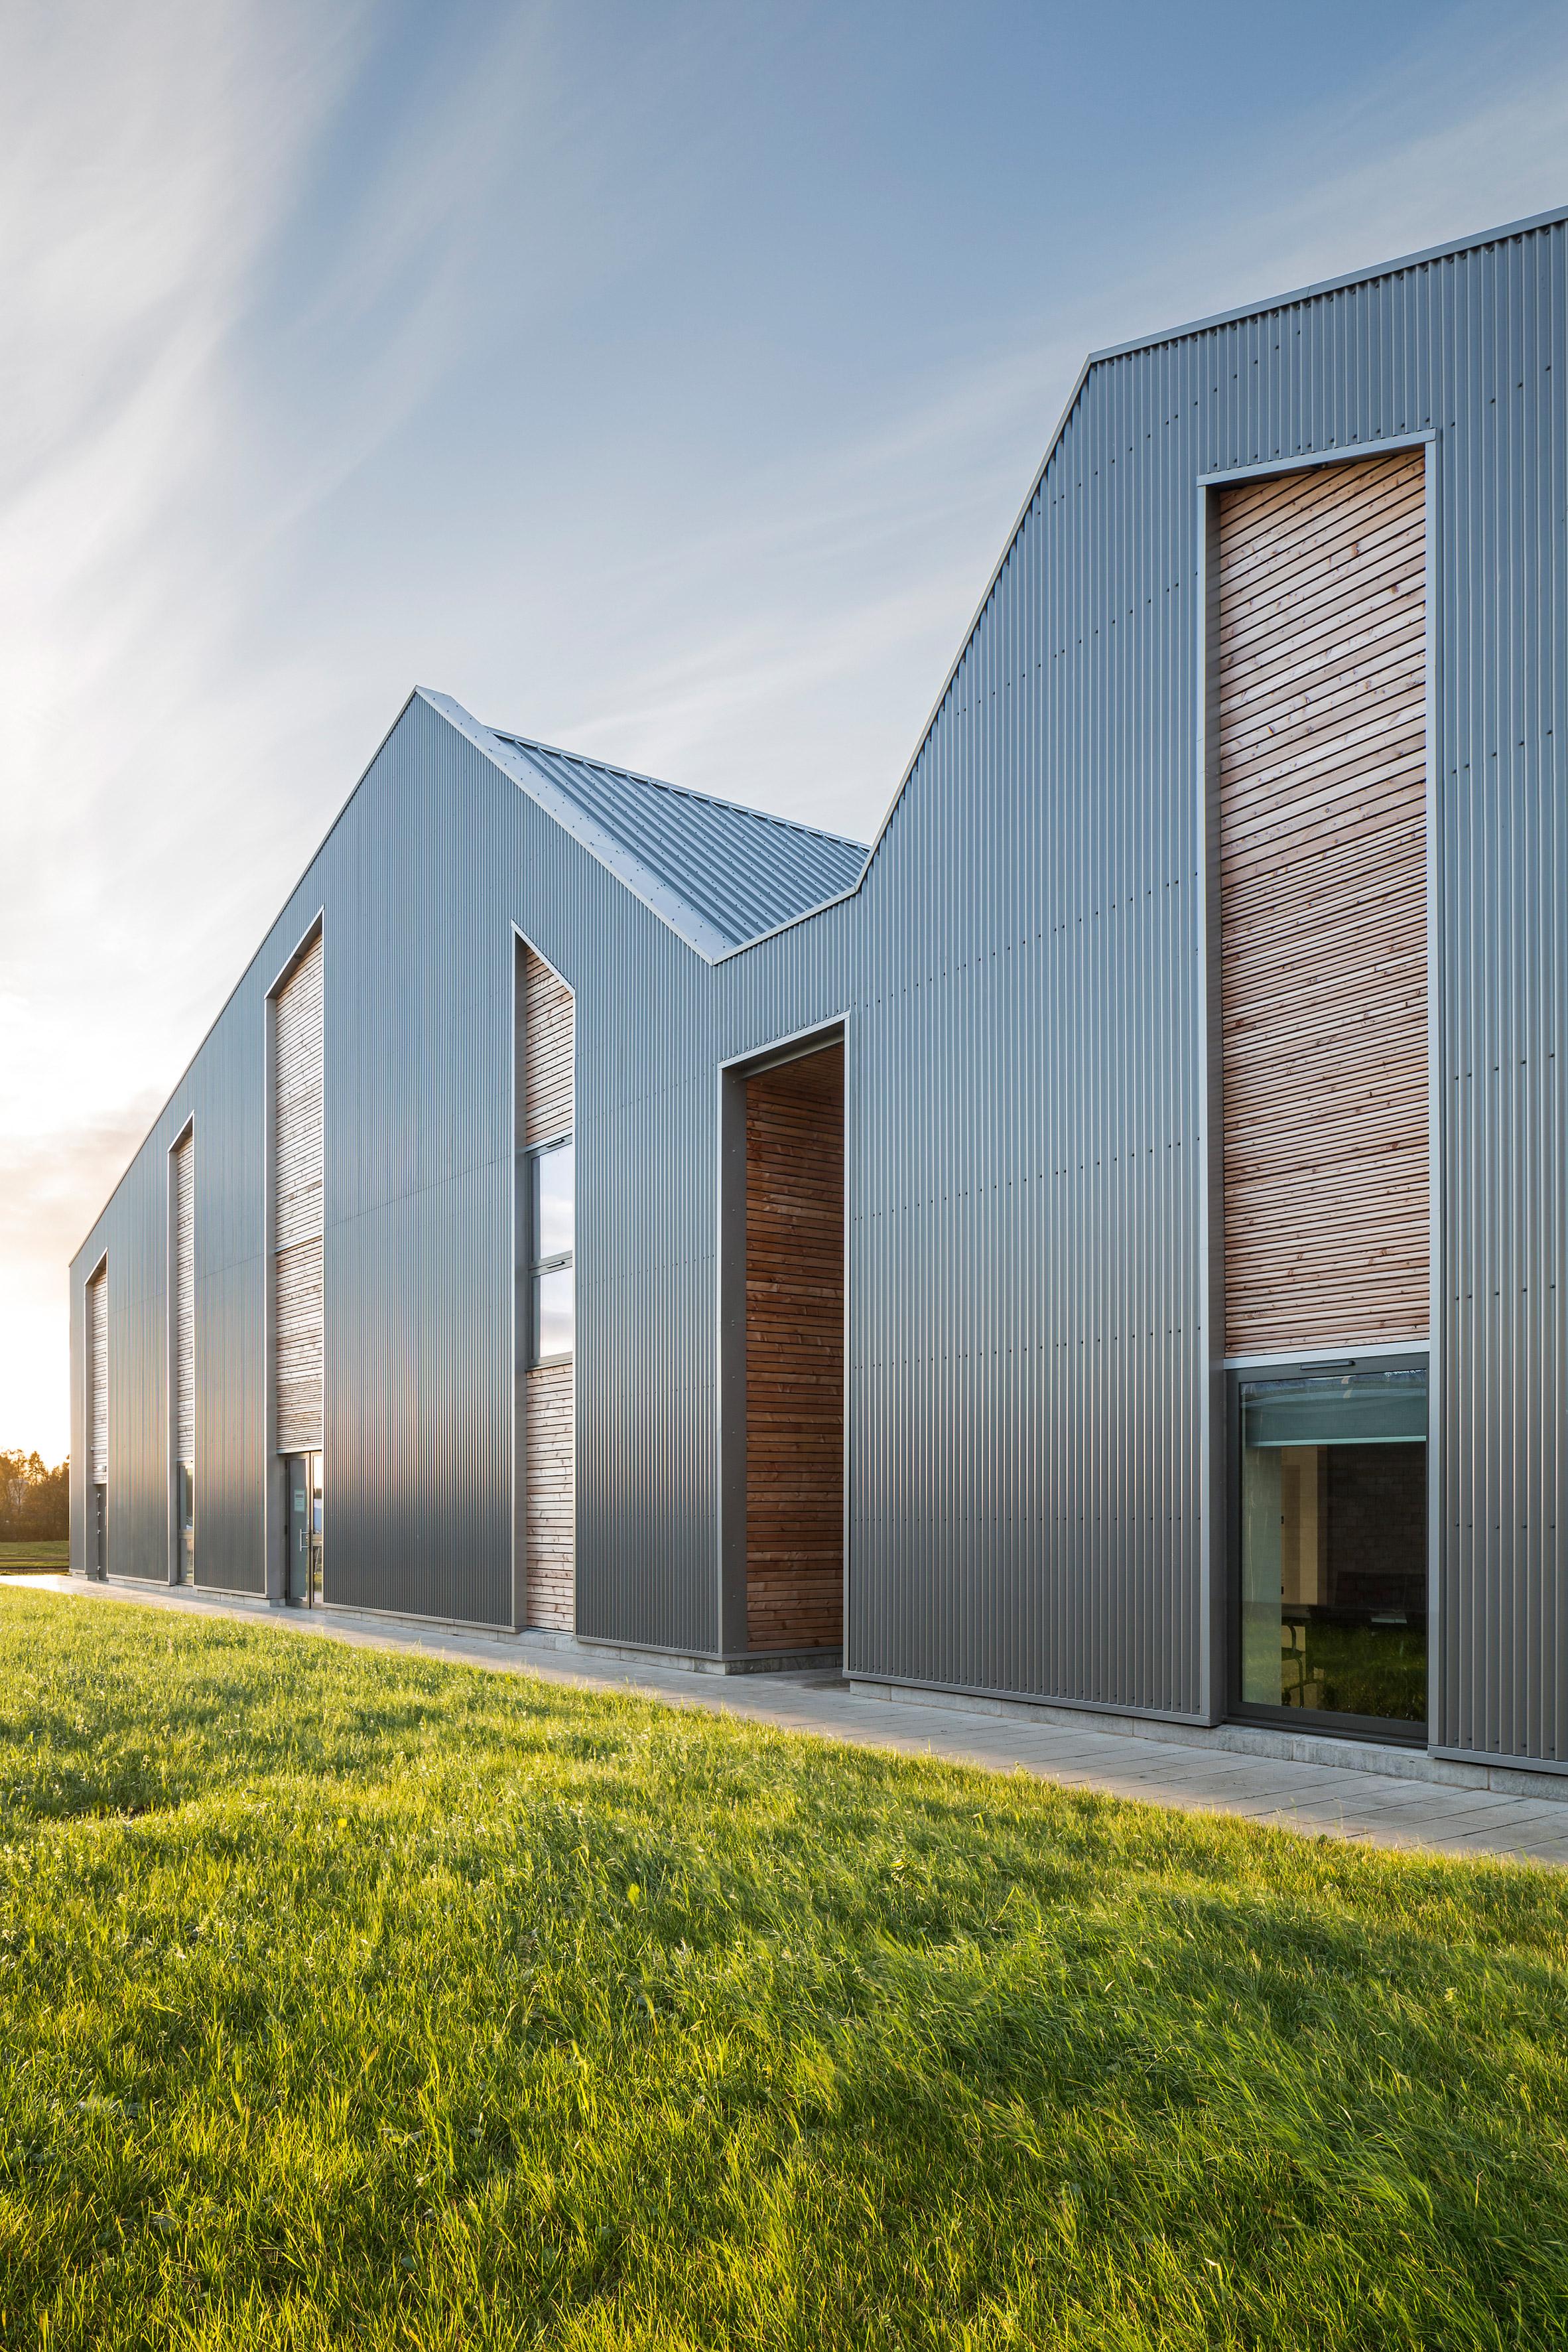 Sheppard Robson designs barn-style extension for Edinburgh horse hospital